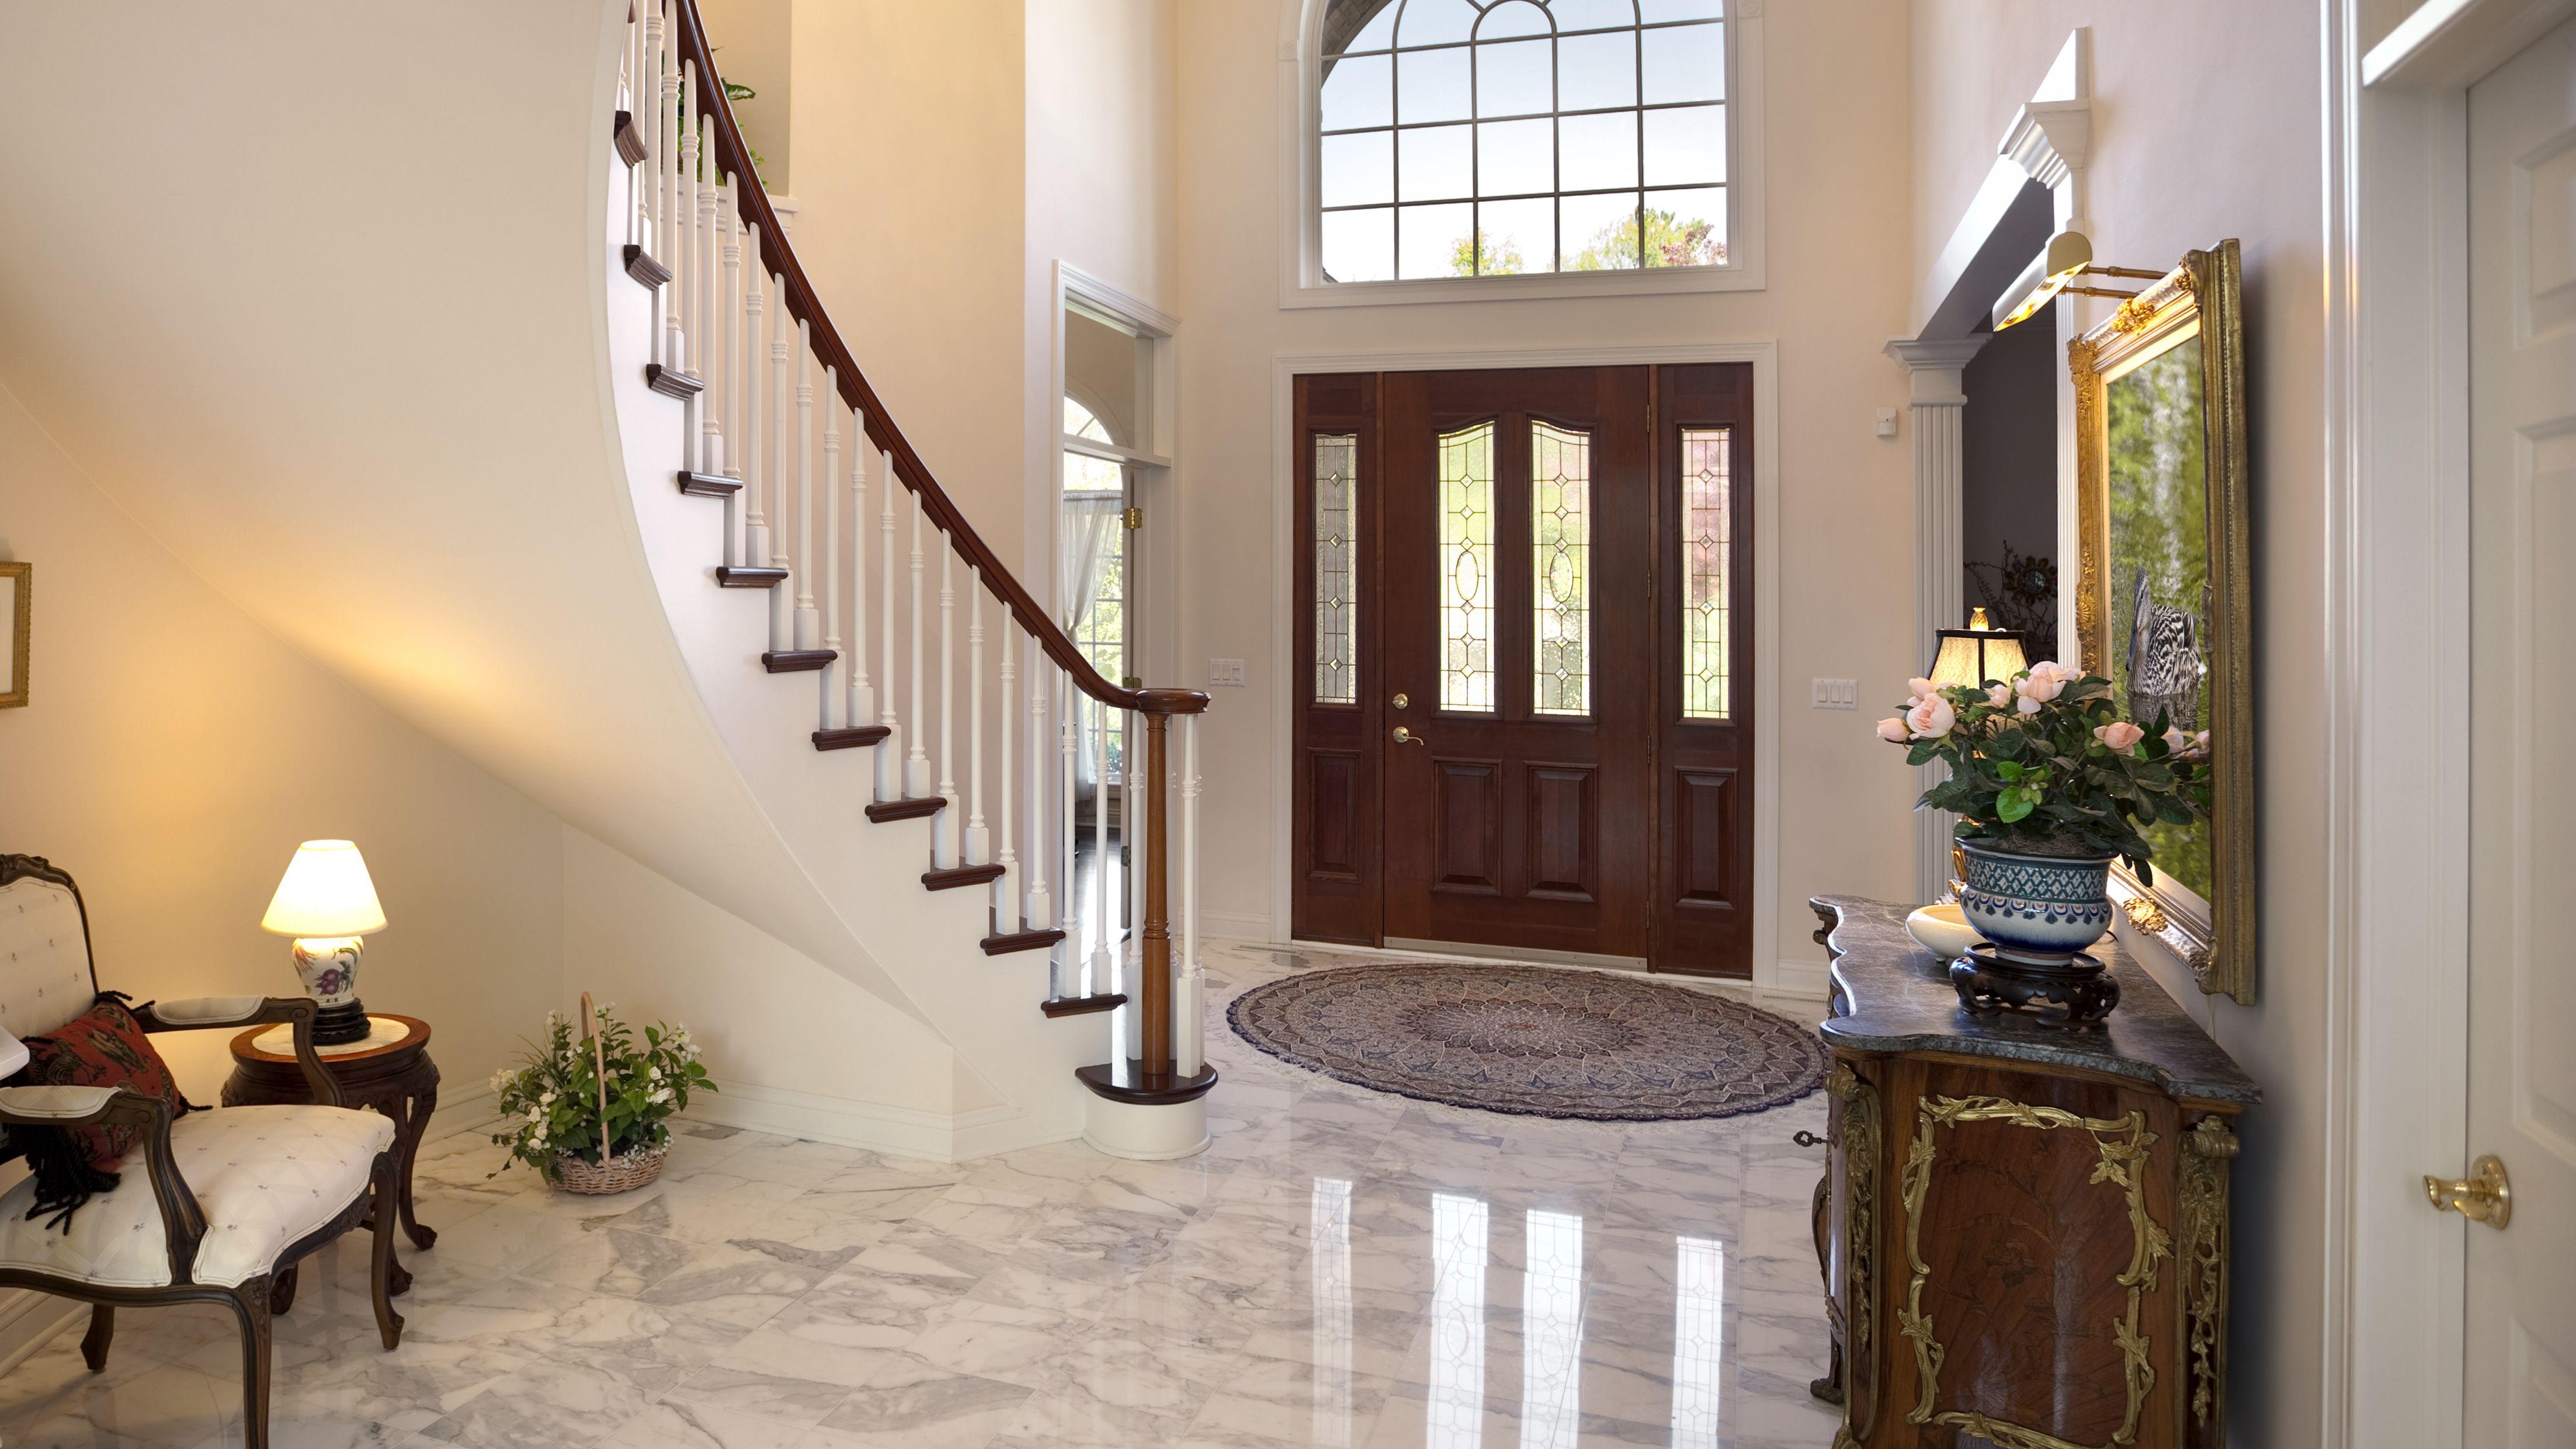 grand-foyer--staircase--chandelier--marble-floor-showcase-home-interior-design-157593982-5c456bbd46e0fb0001aac789